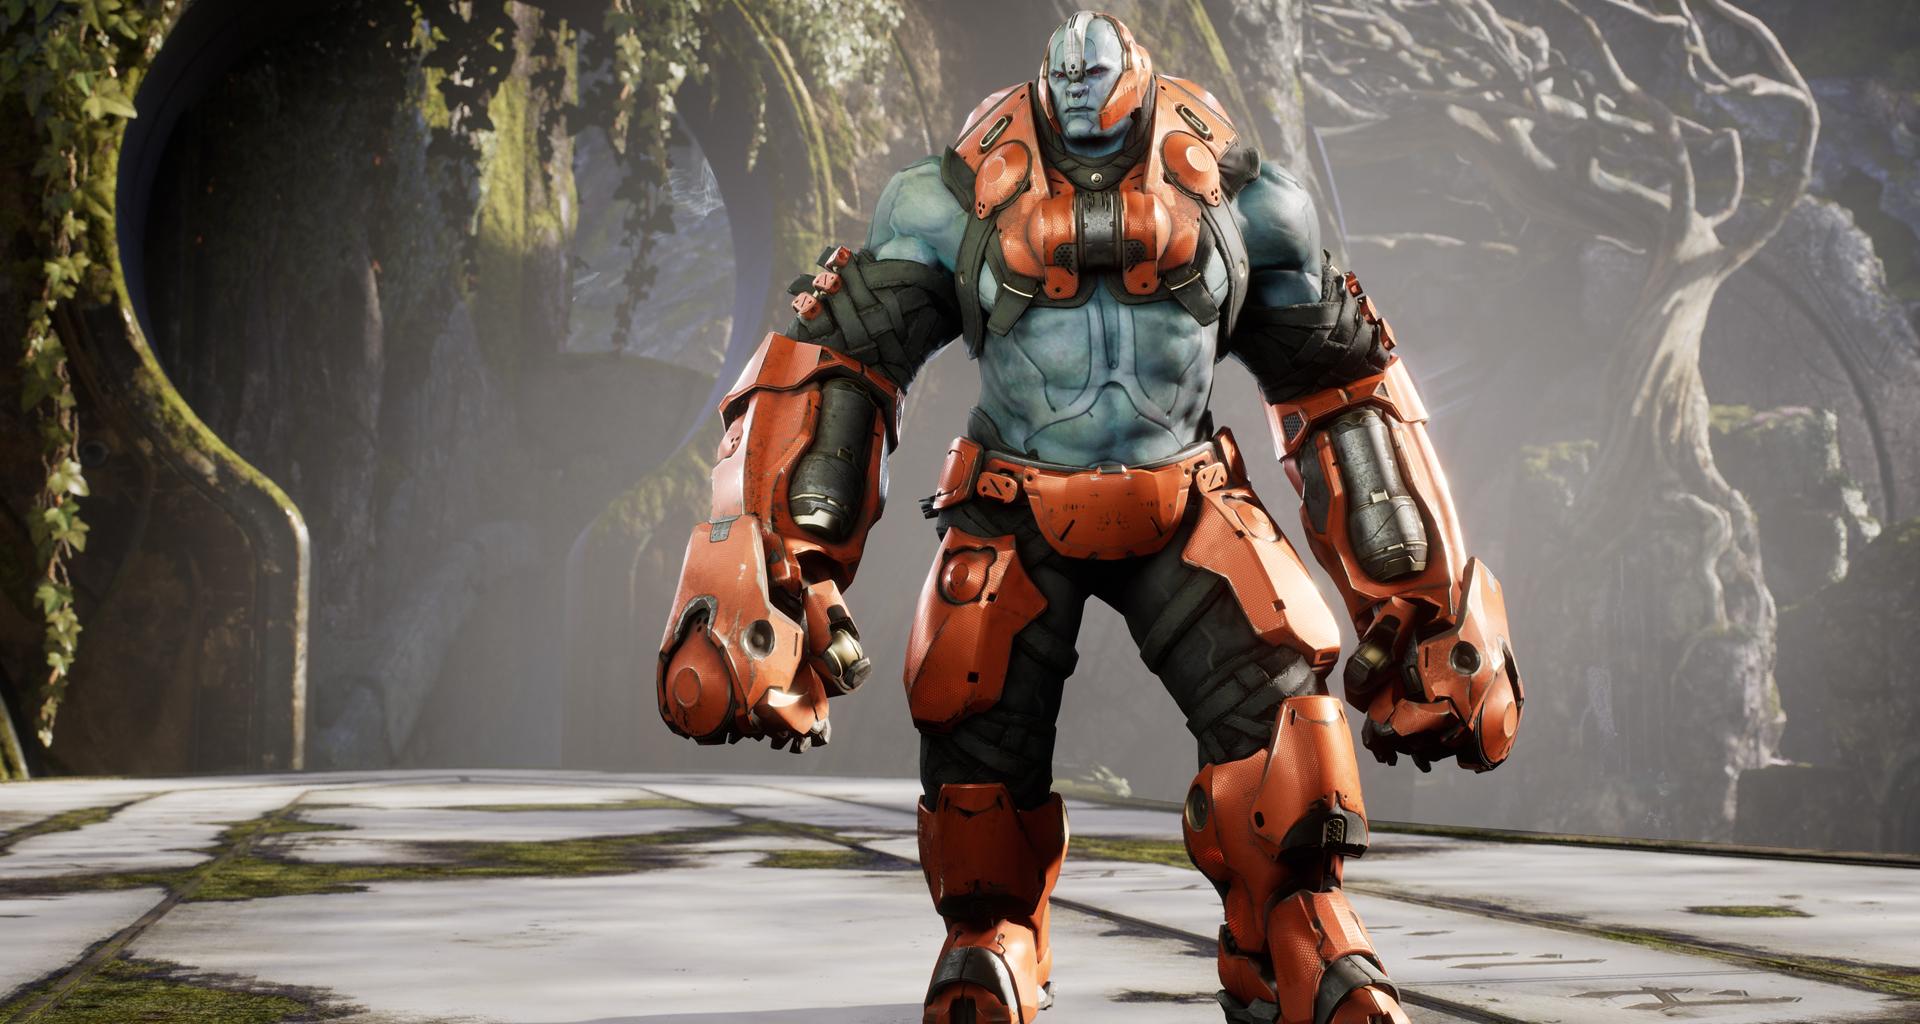 Hero_Header_Steel-1920x1024-1745958691.j